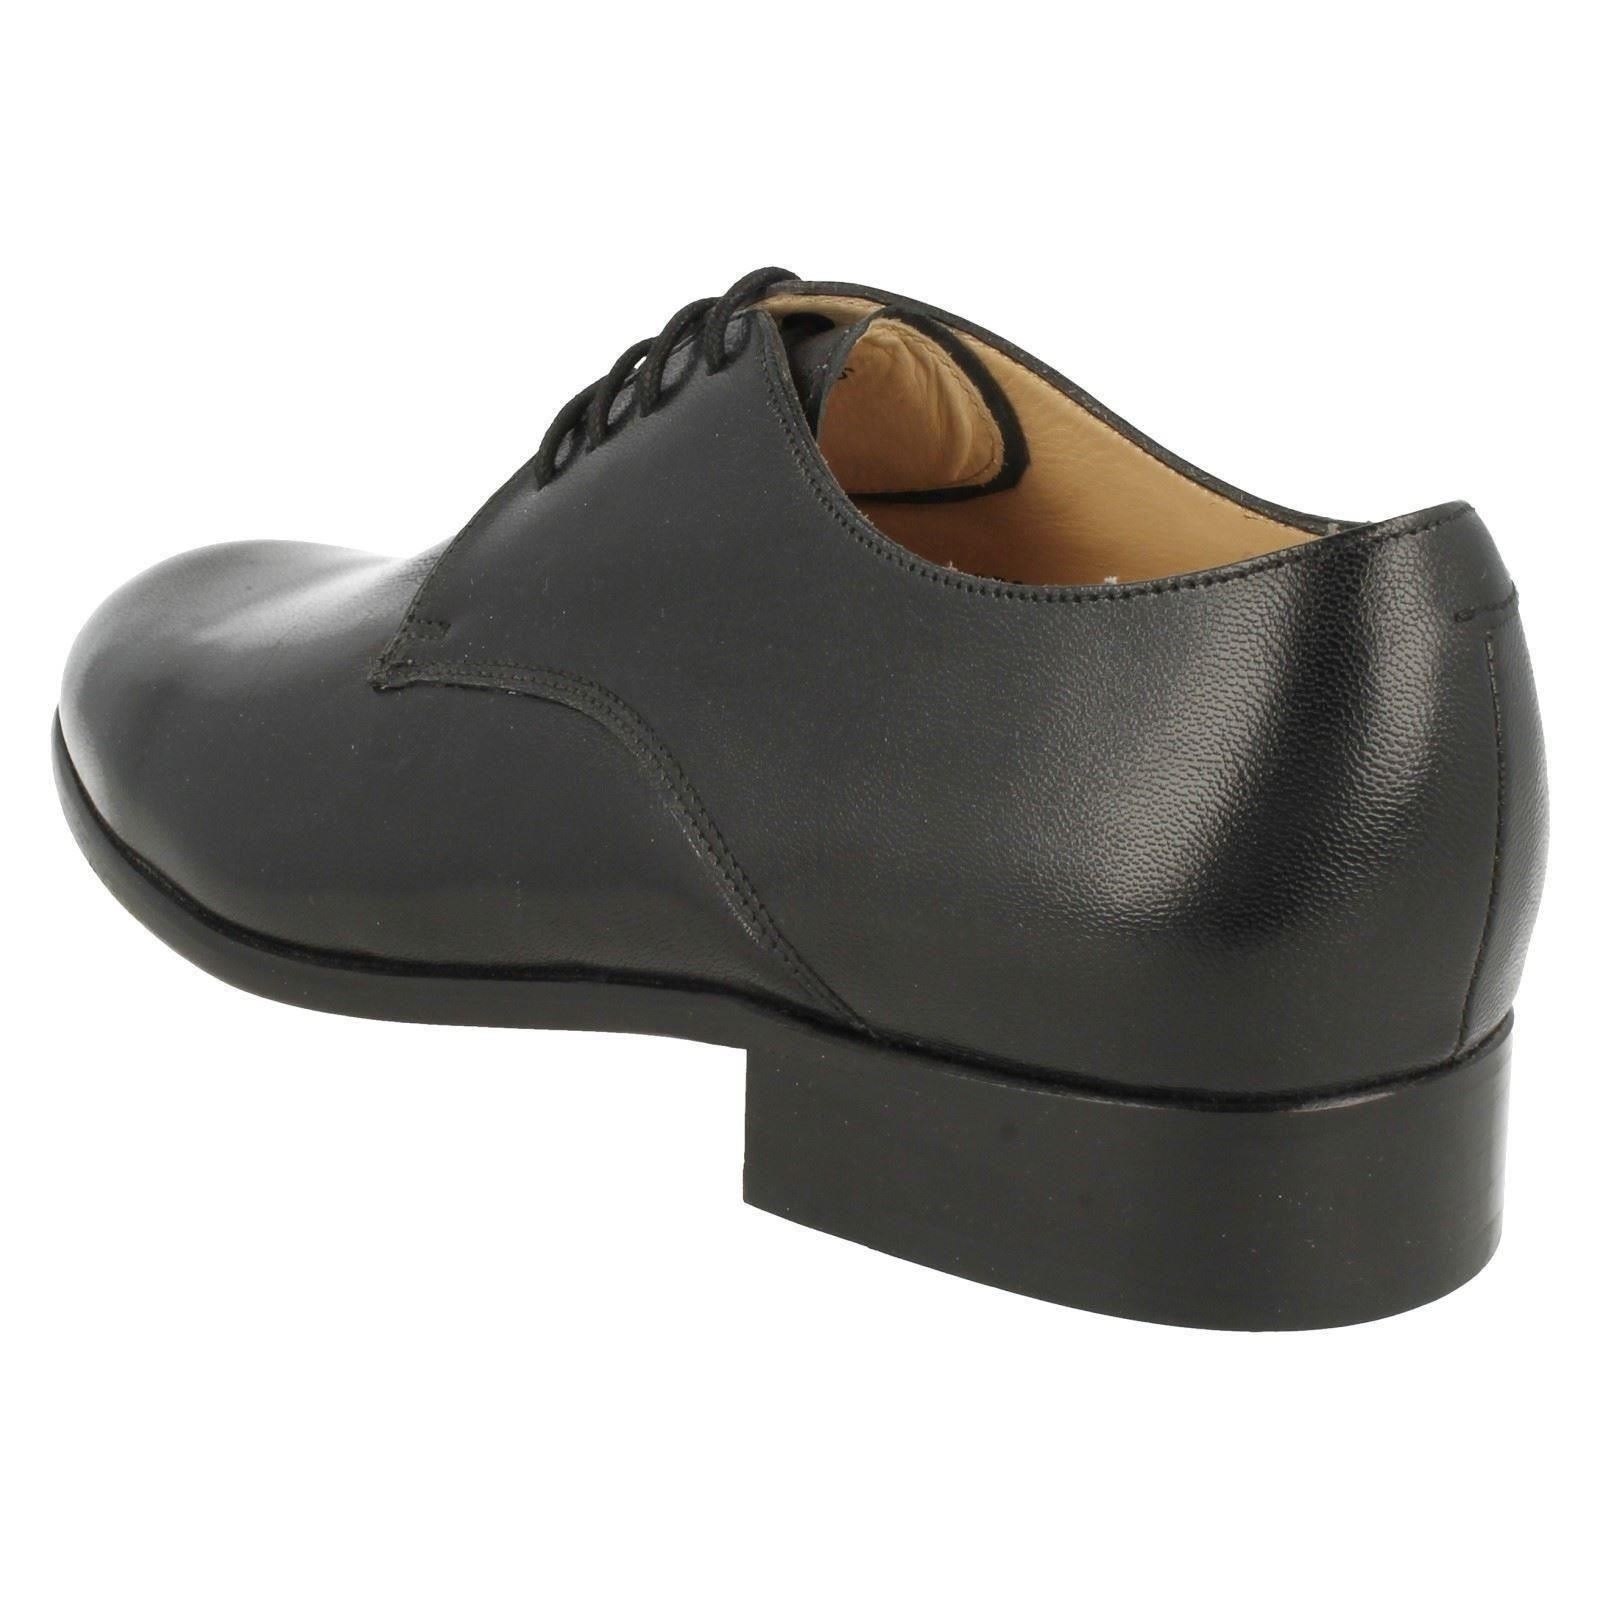 Grenson Chaussures Hommes Habill Grenson Hommes Grenson Habill Chaussures Chaussures Hommes 55rBq